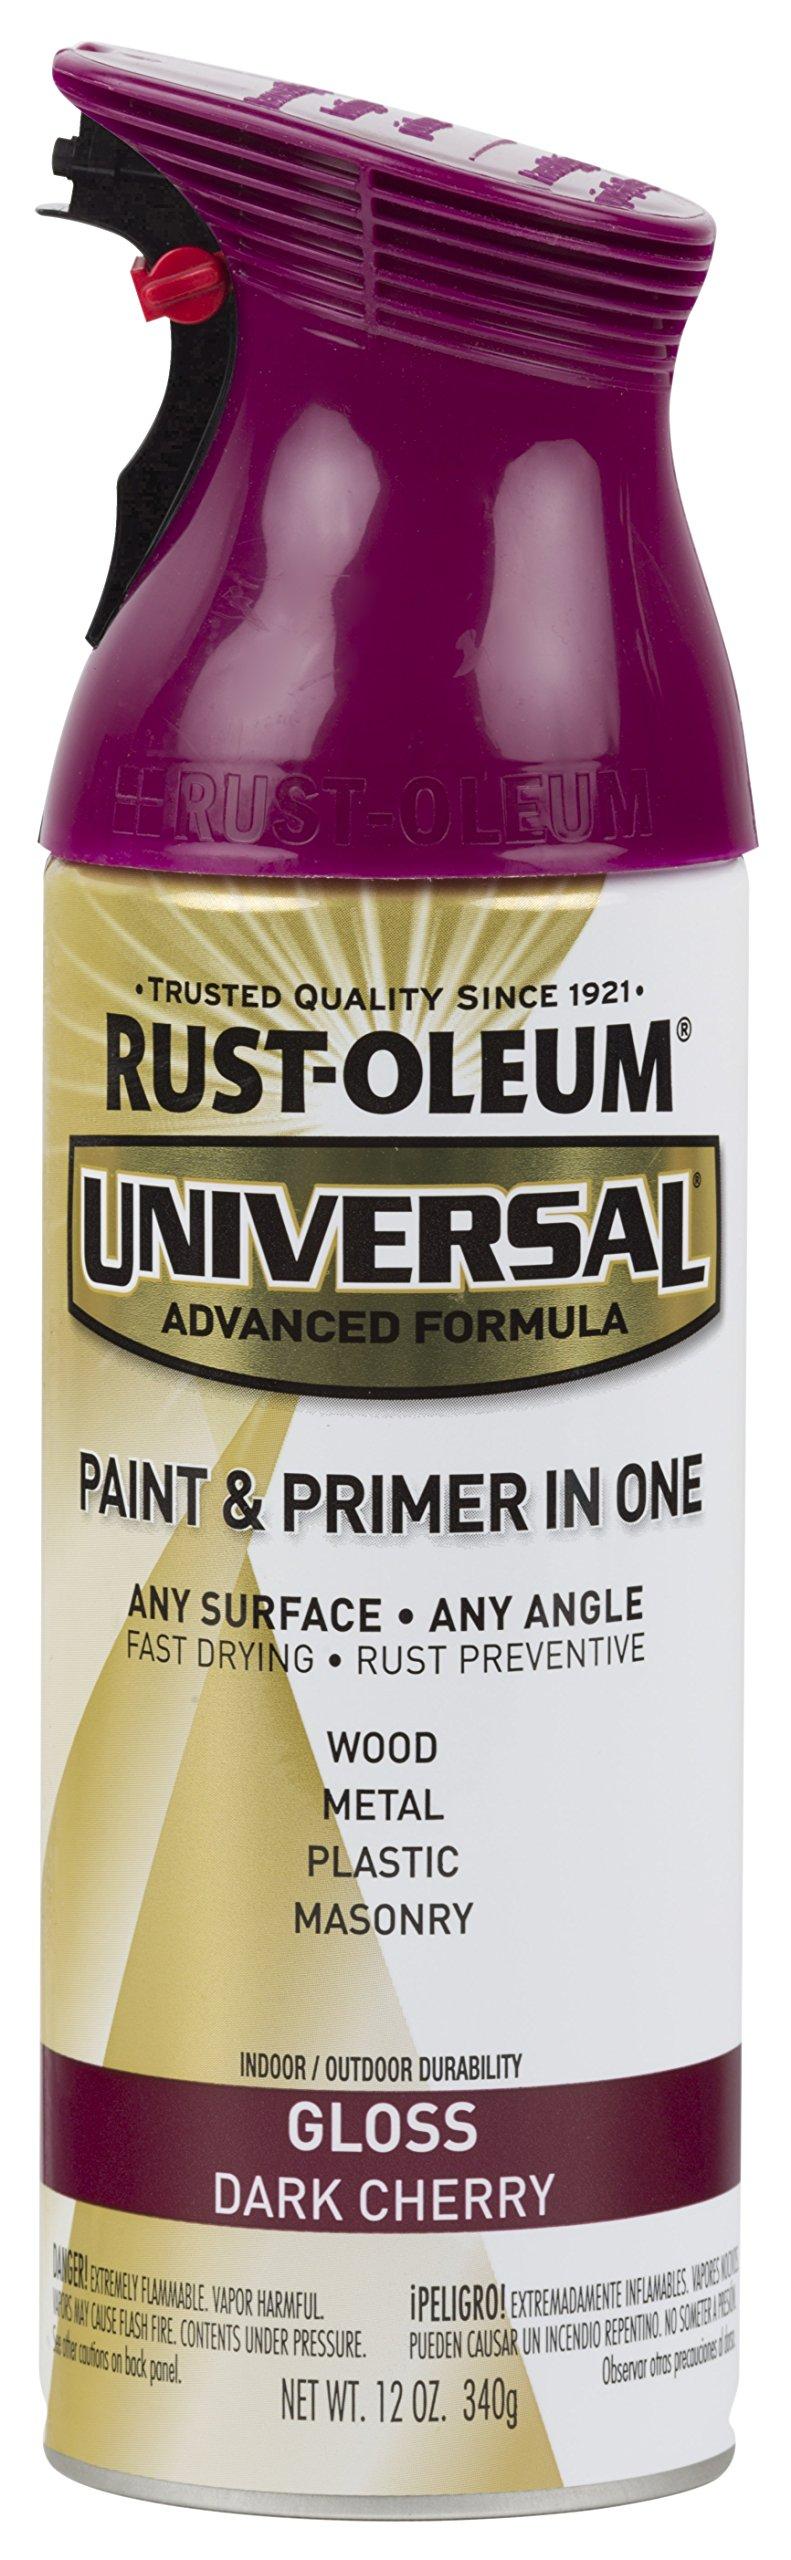 Rust-Oleum 284959-6PK Universal All Surface Spray Paint, 6 Pack, Gloss Dark Cherry